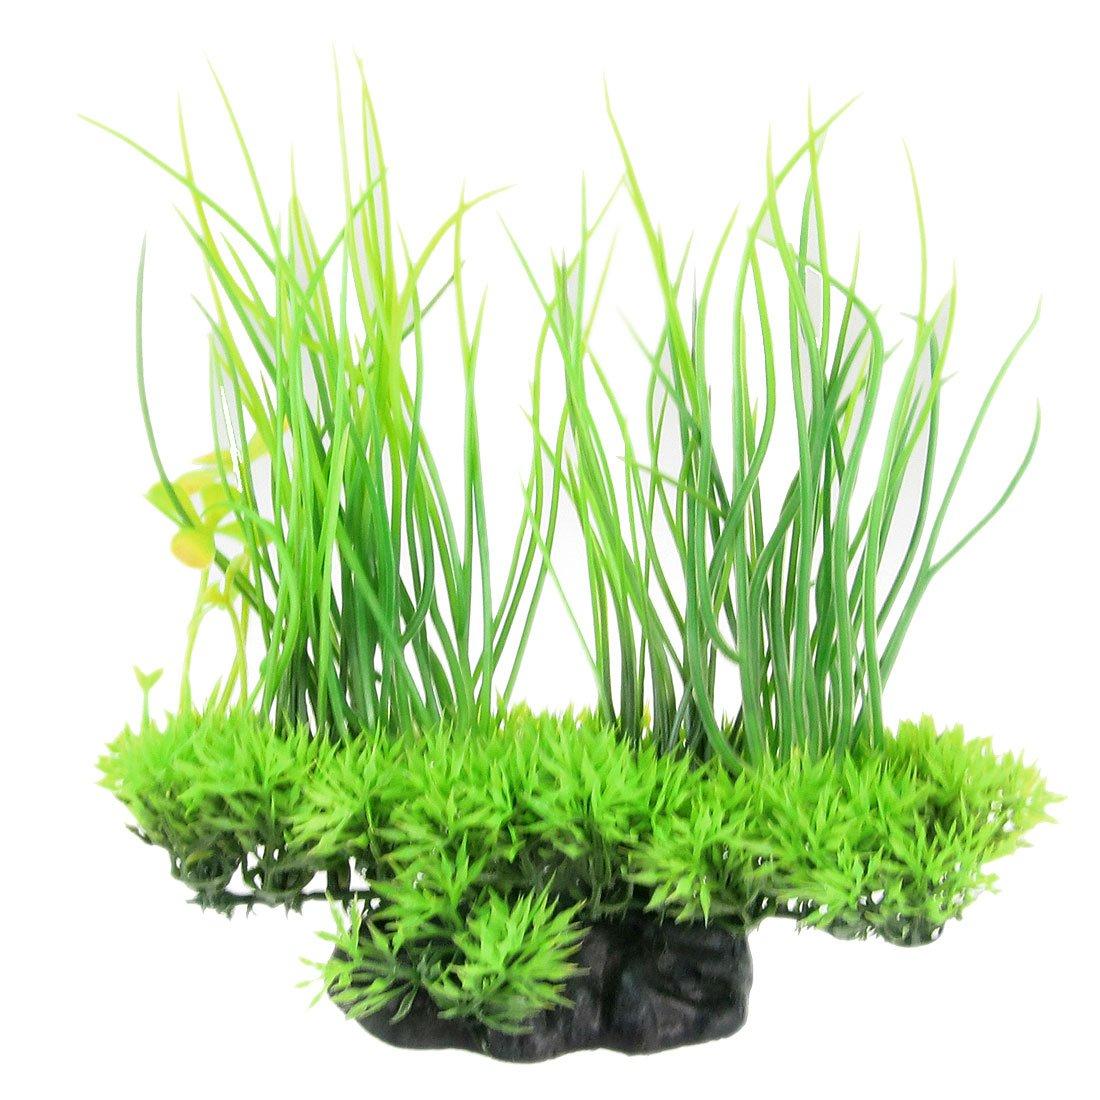 Best fish for aquarium plants - Jardin Plastic Emulational Decorative Long Leaf Plant For